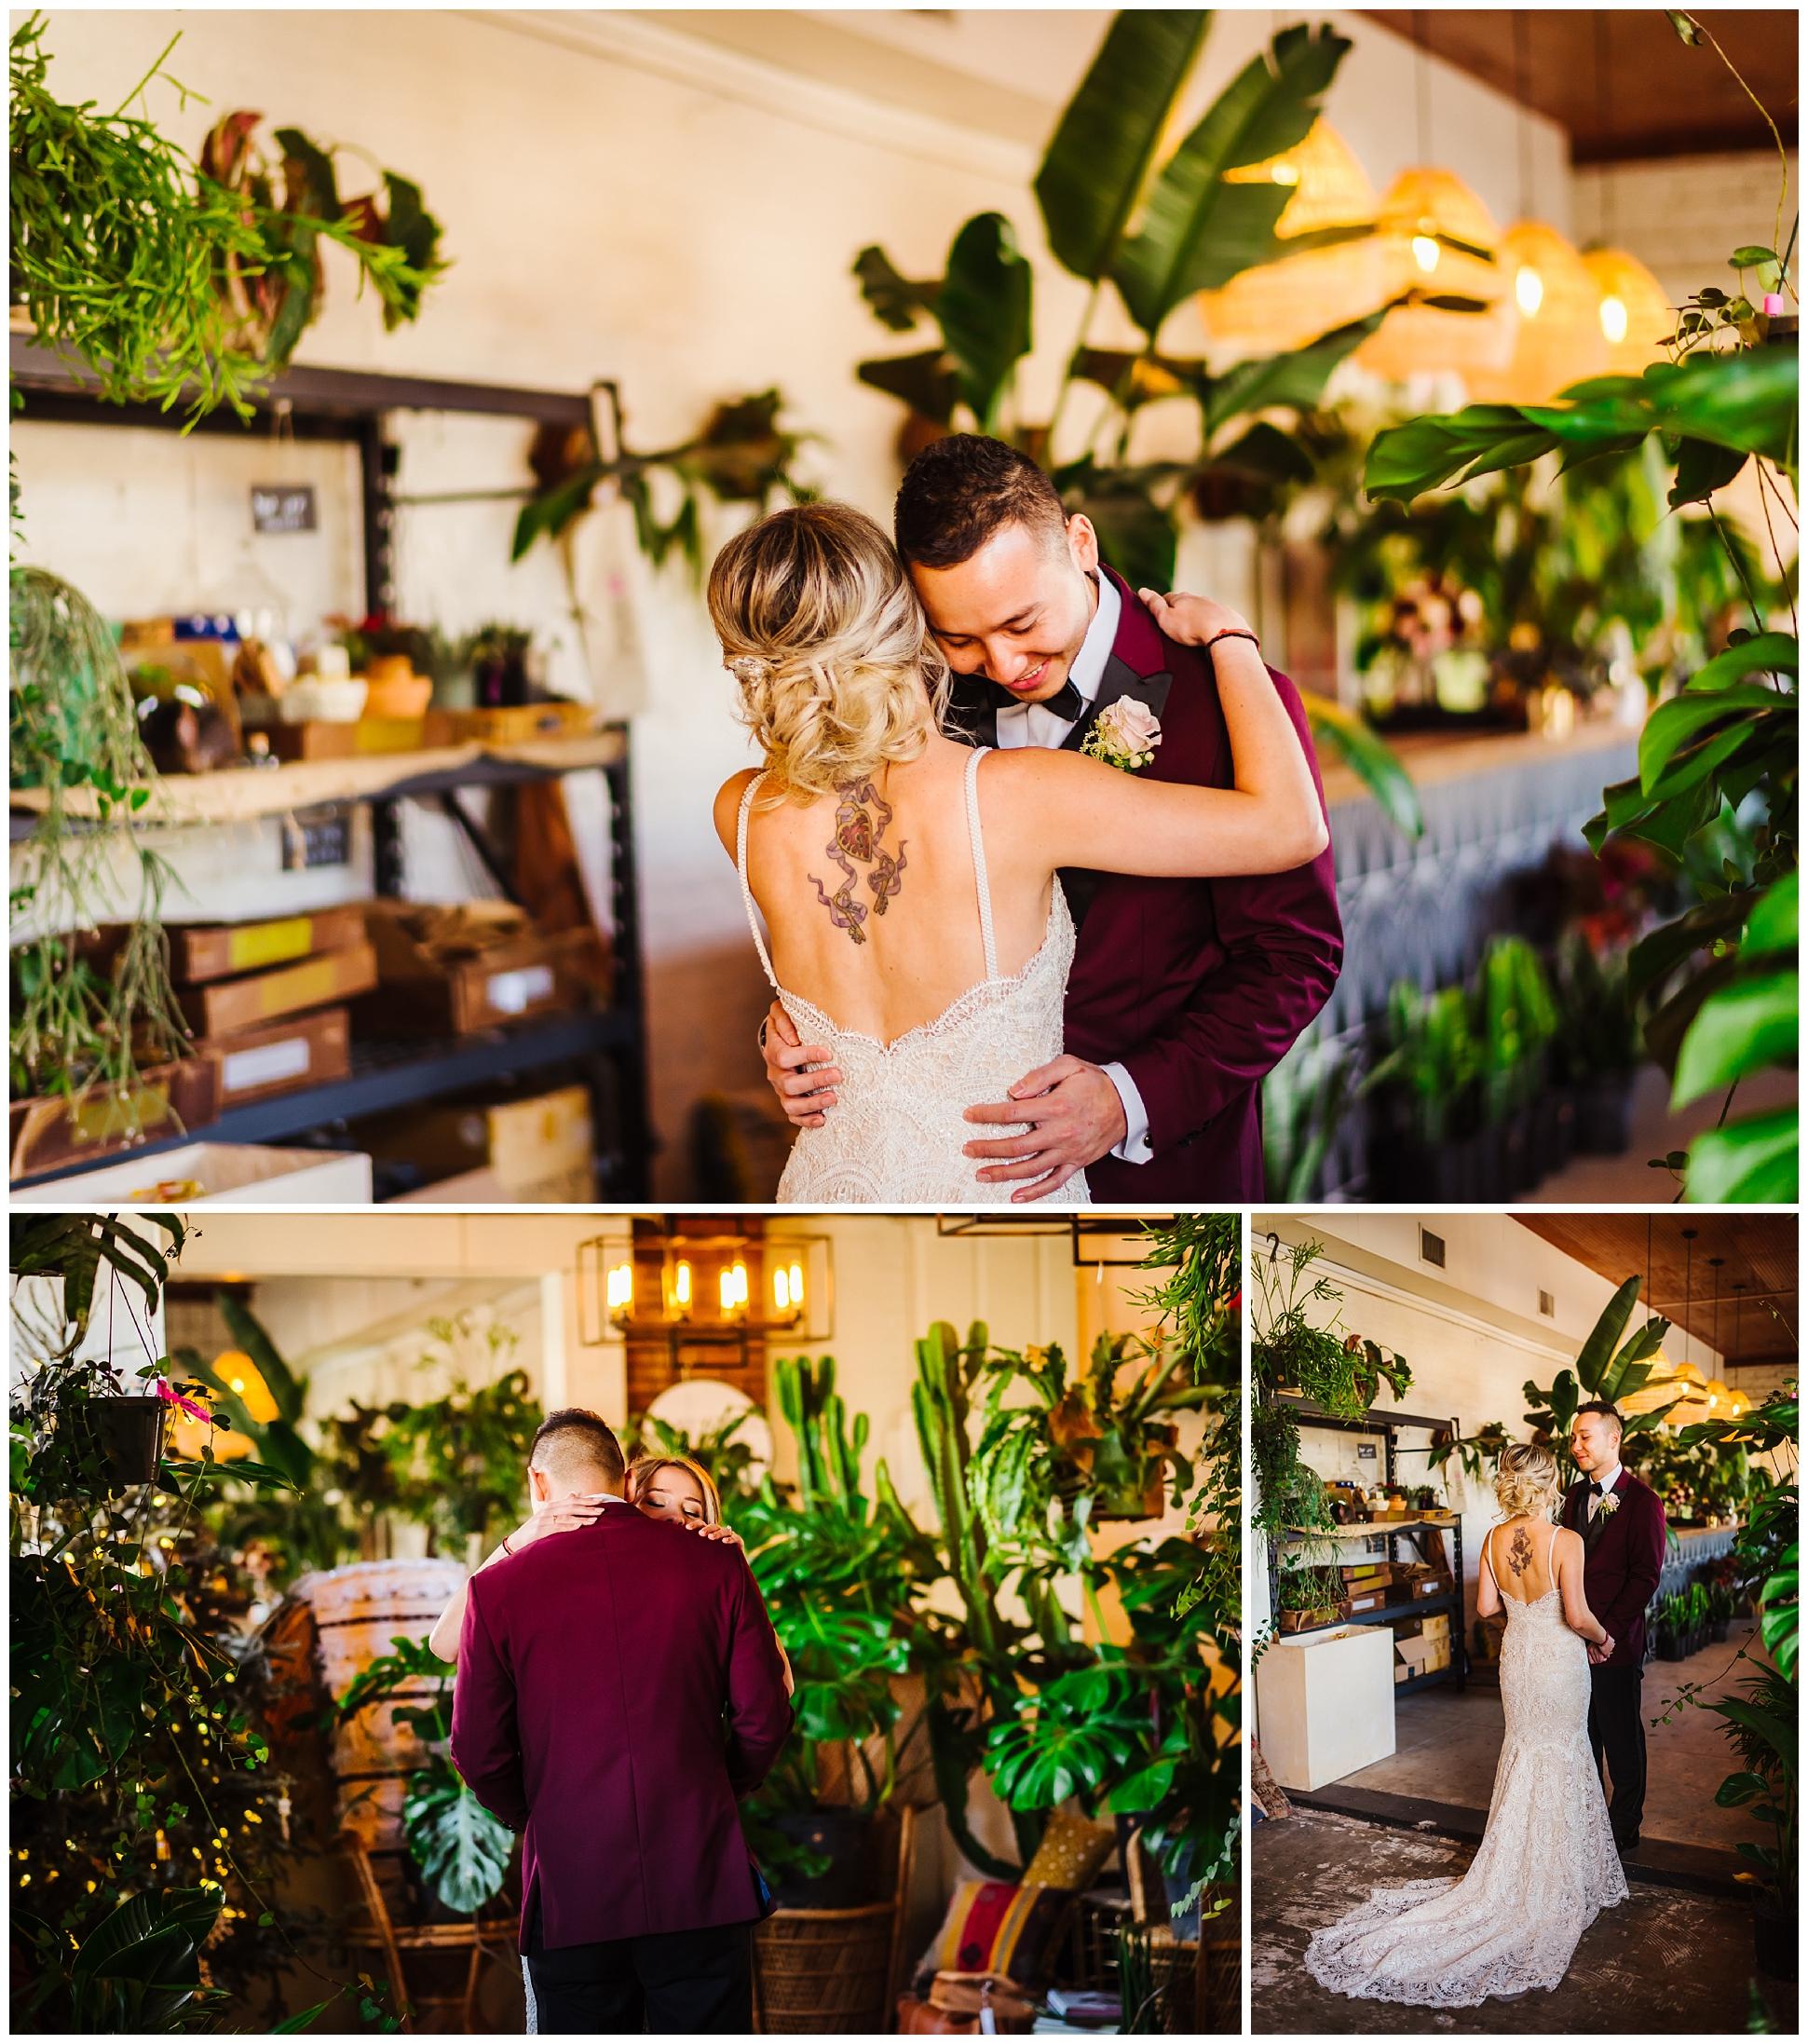 tampa-armeture-wedding-photographer-edgy-industrial-downtown-fancy-free-nursery-tattoo-burgandy-velvet_0023.jpg